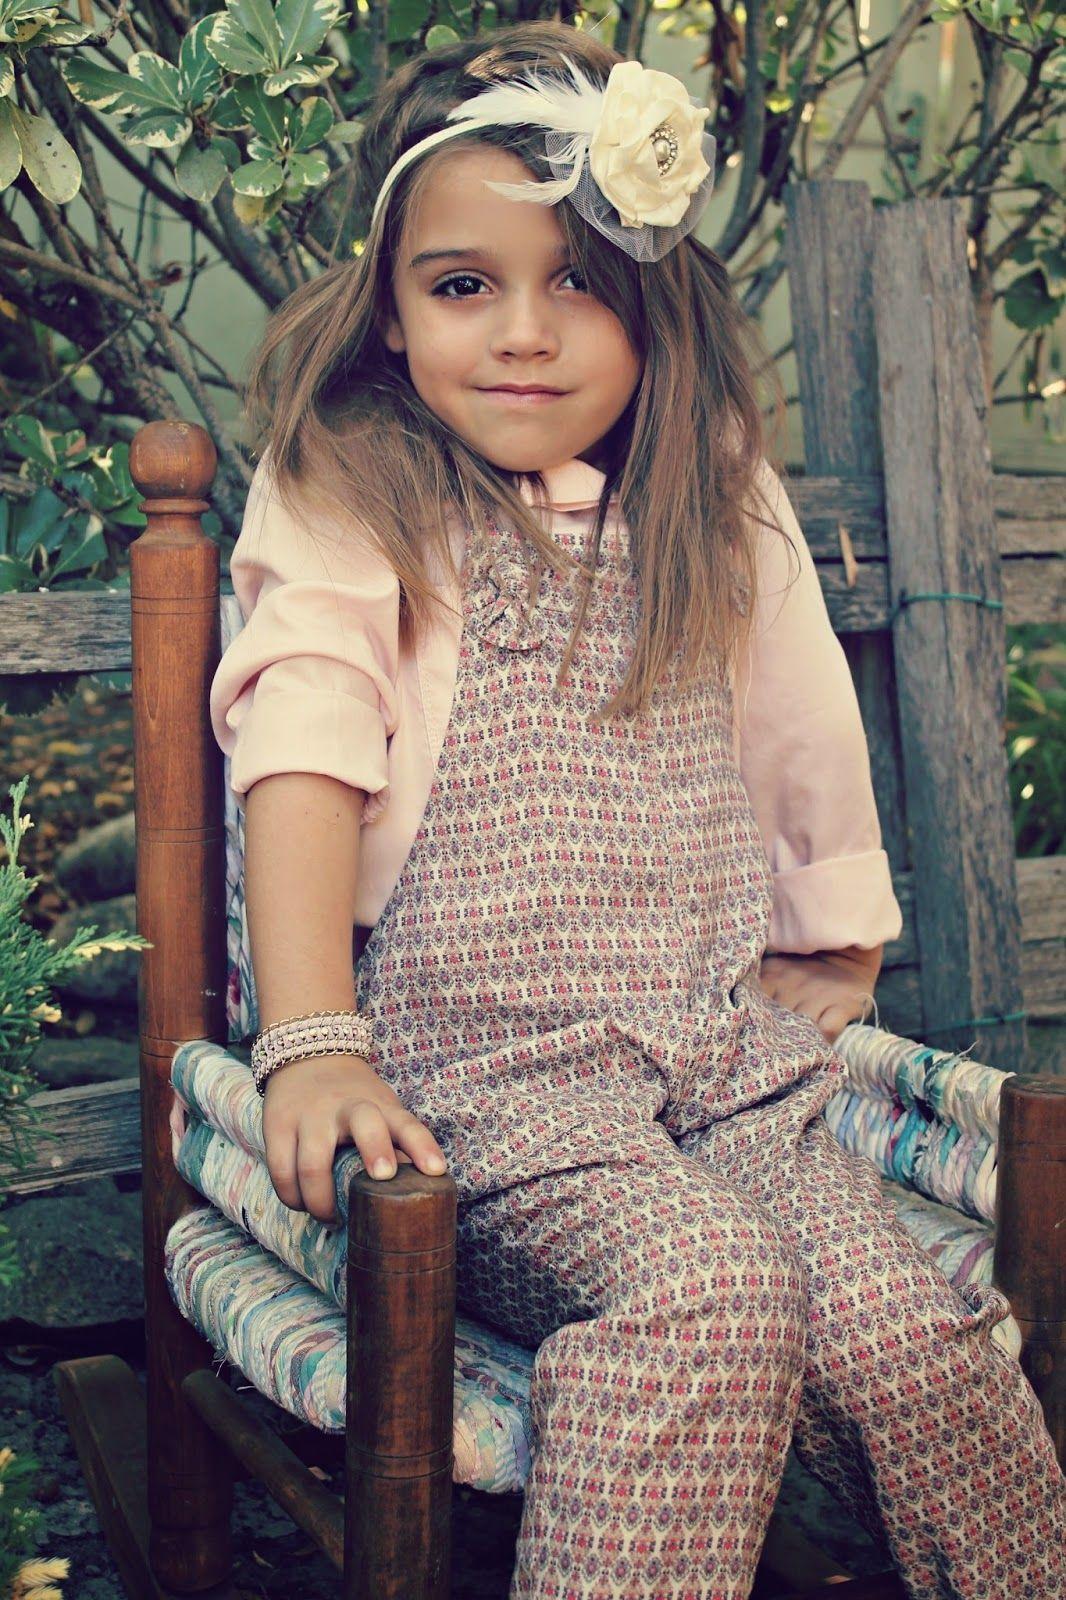 Zara baby hair accessories - Albf Mini Trendy Accessories For Girls Bracelets Boho Kids Style Trendy Kids Kids